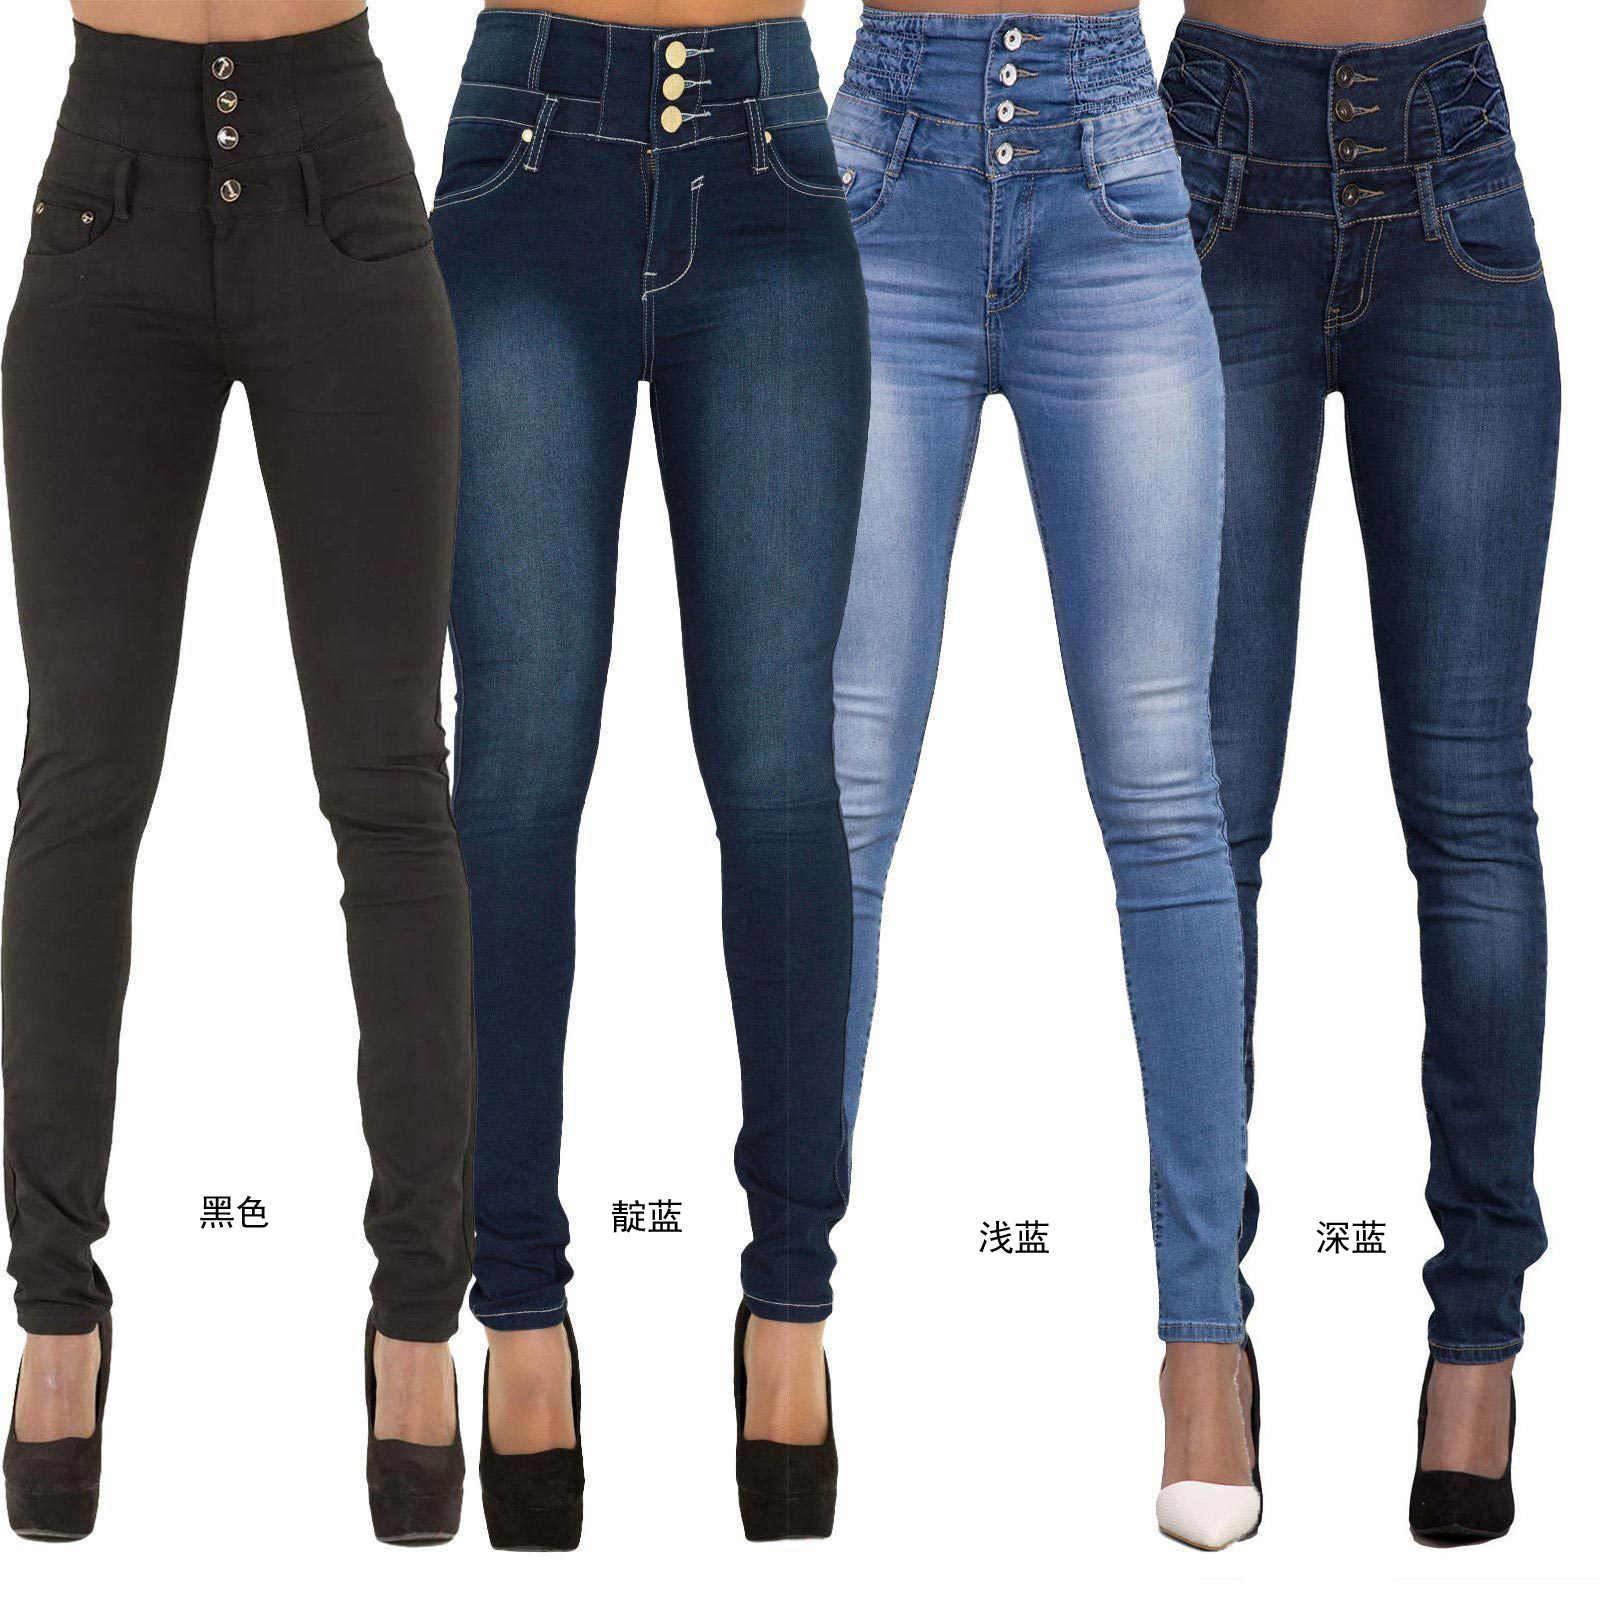 2019 New Arrival Woman Denim Pencil Pants Top Brand Stretch ladies black skinny Jeans High Waist Pants Women High Waist Jeans